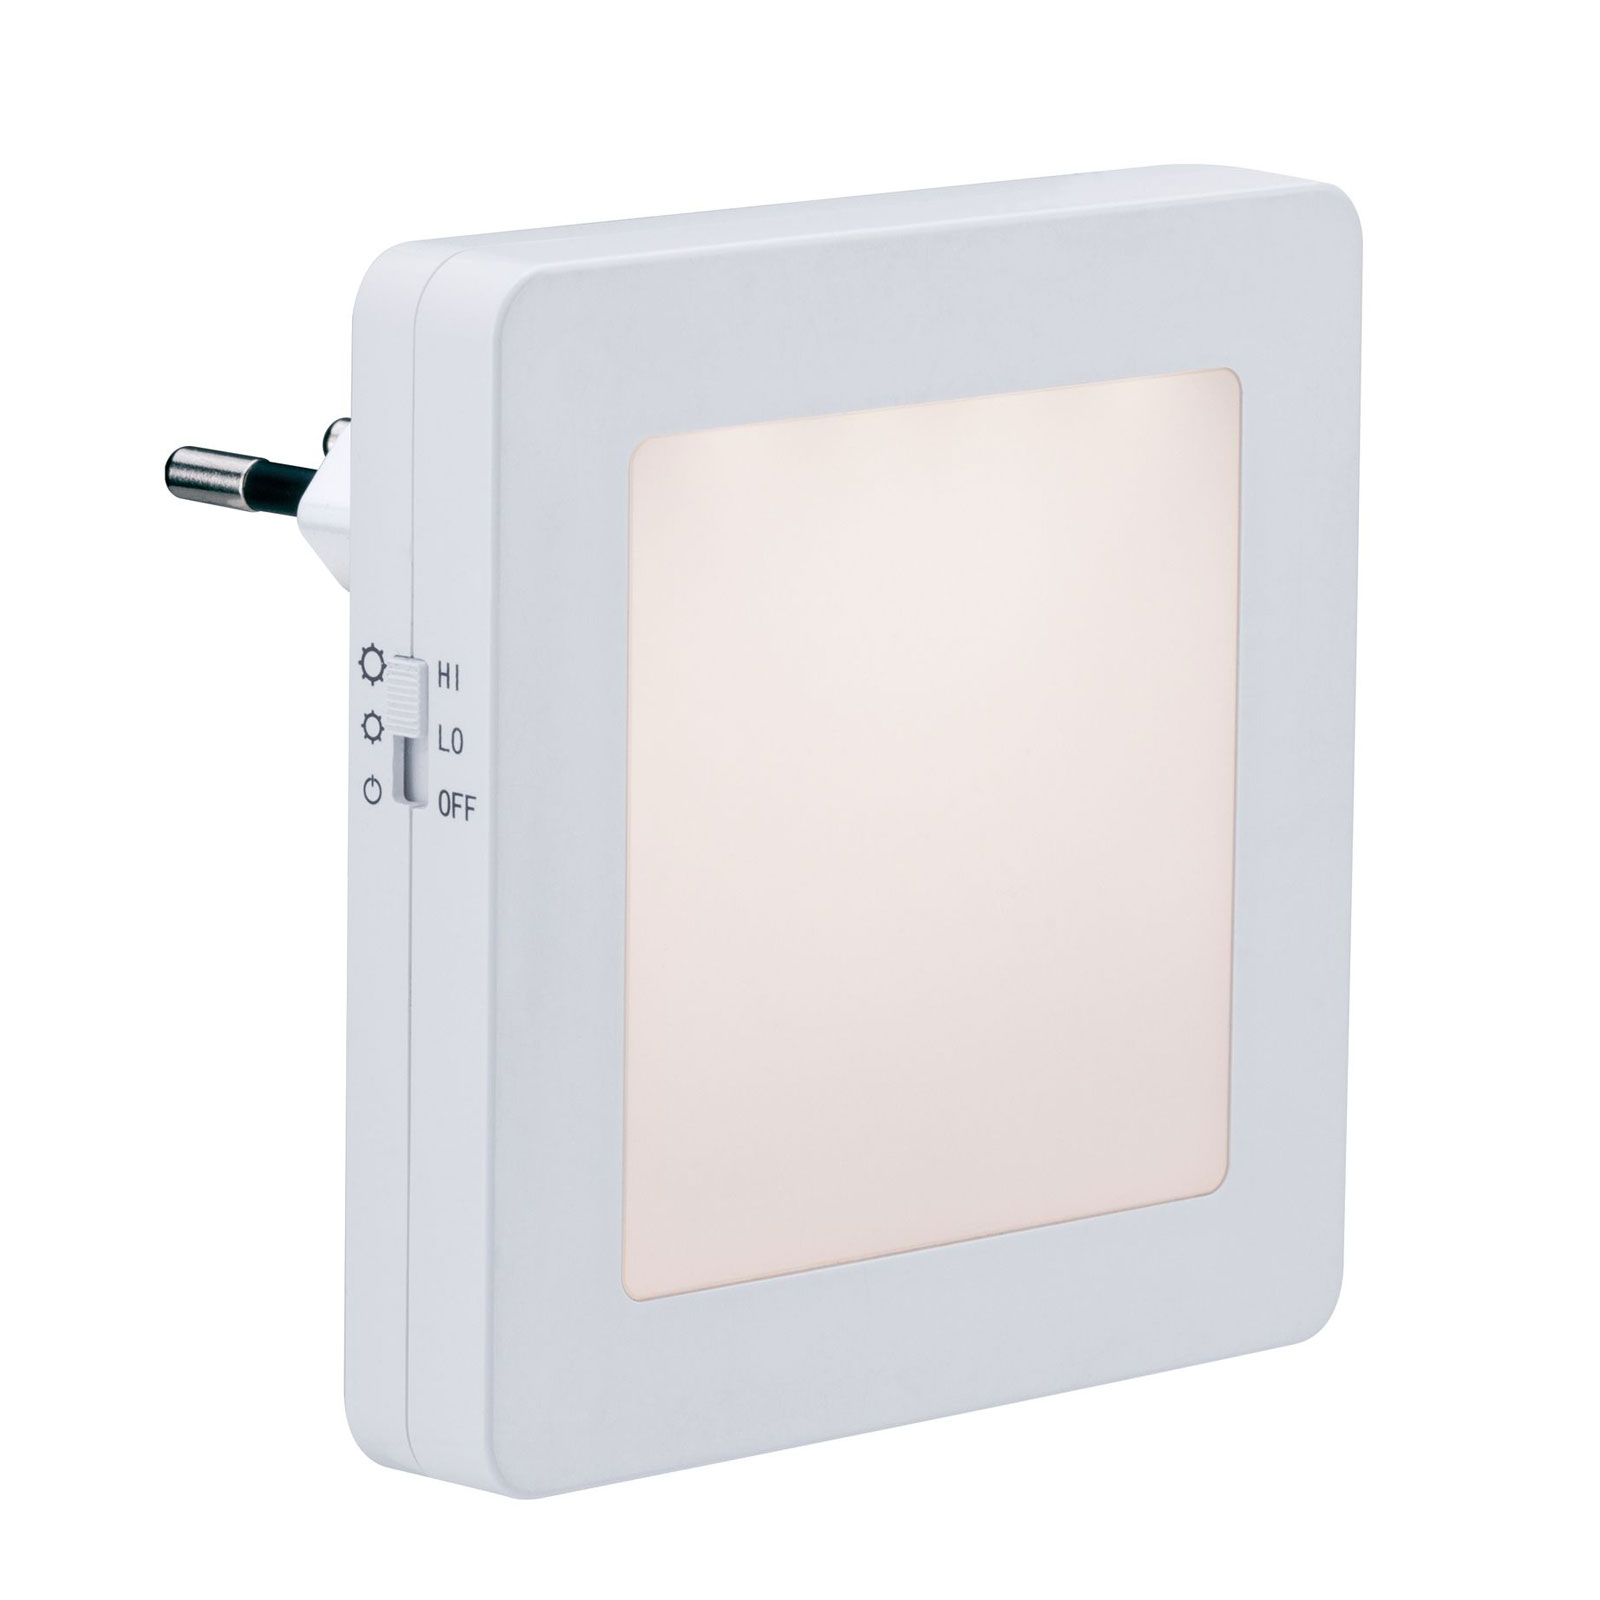 Paulmann Esby LED-Nachtlicht, Steckdose, eckig